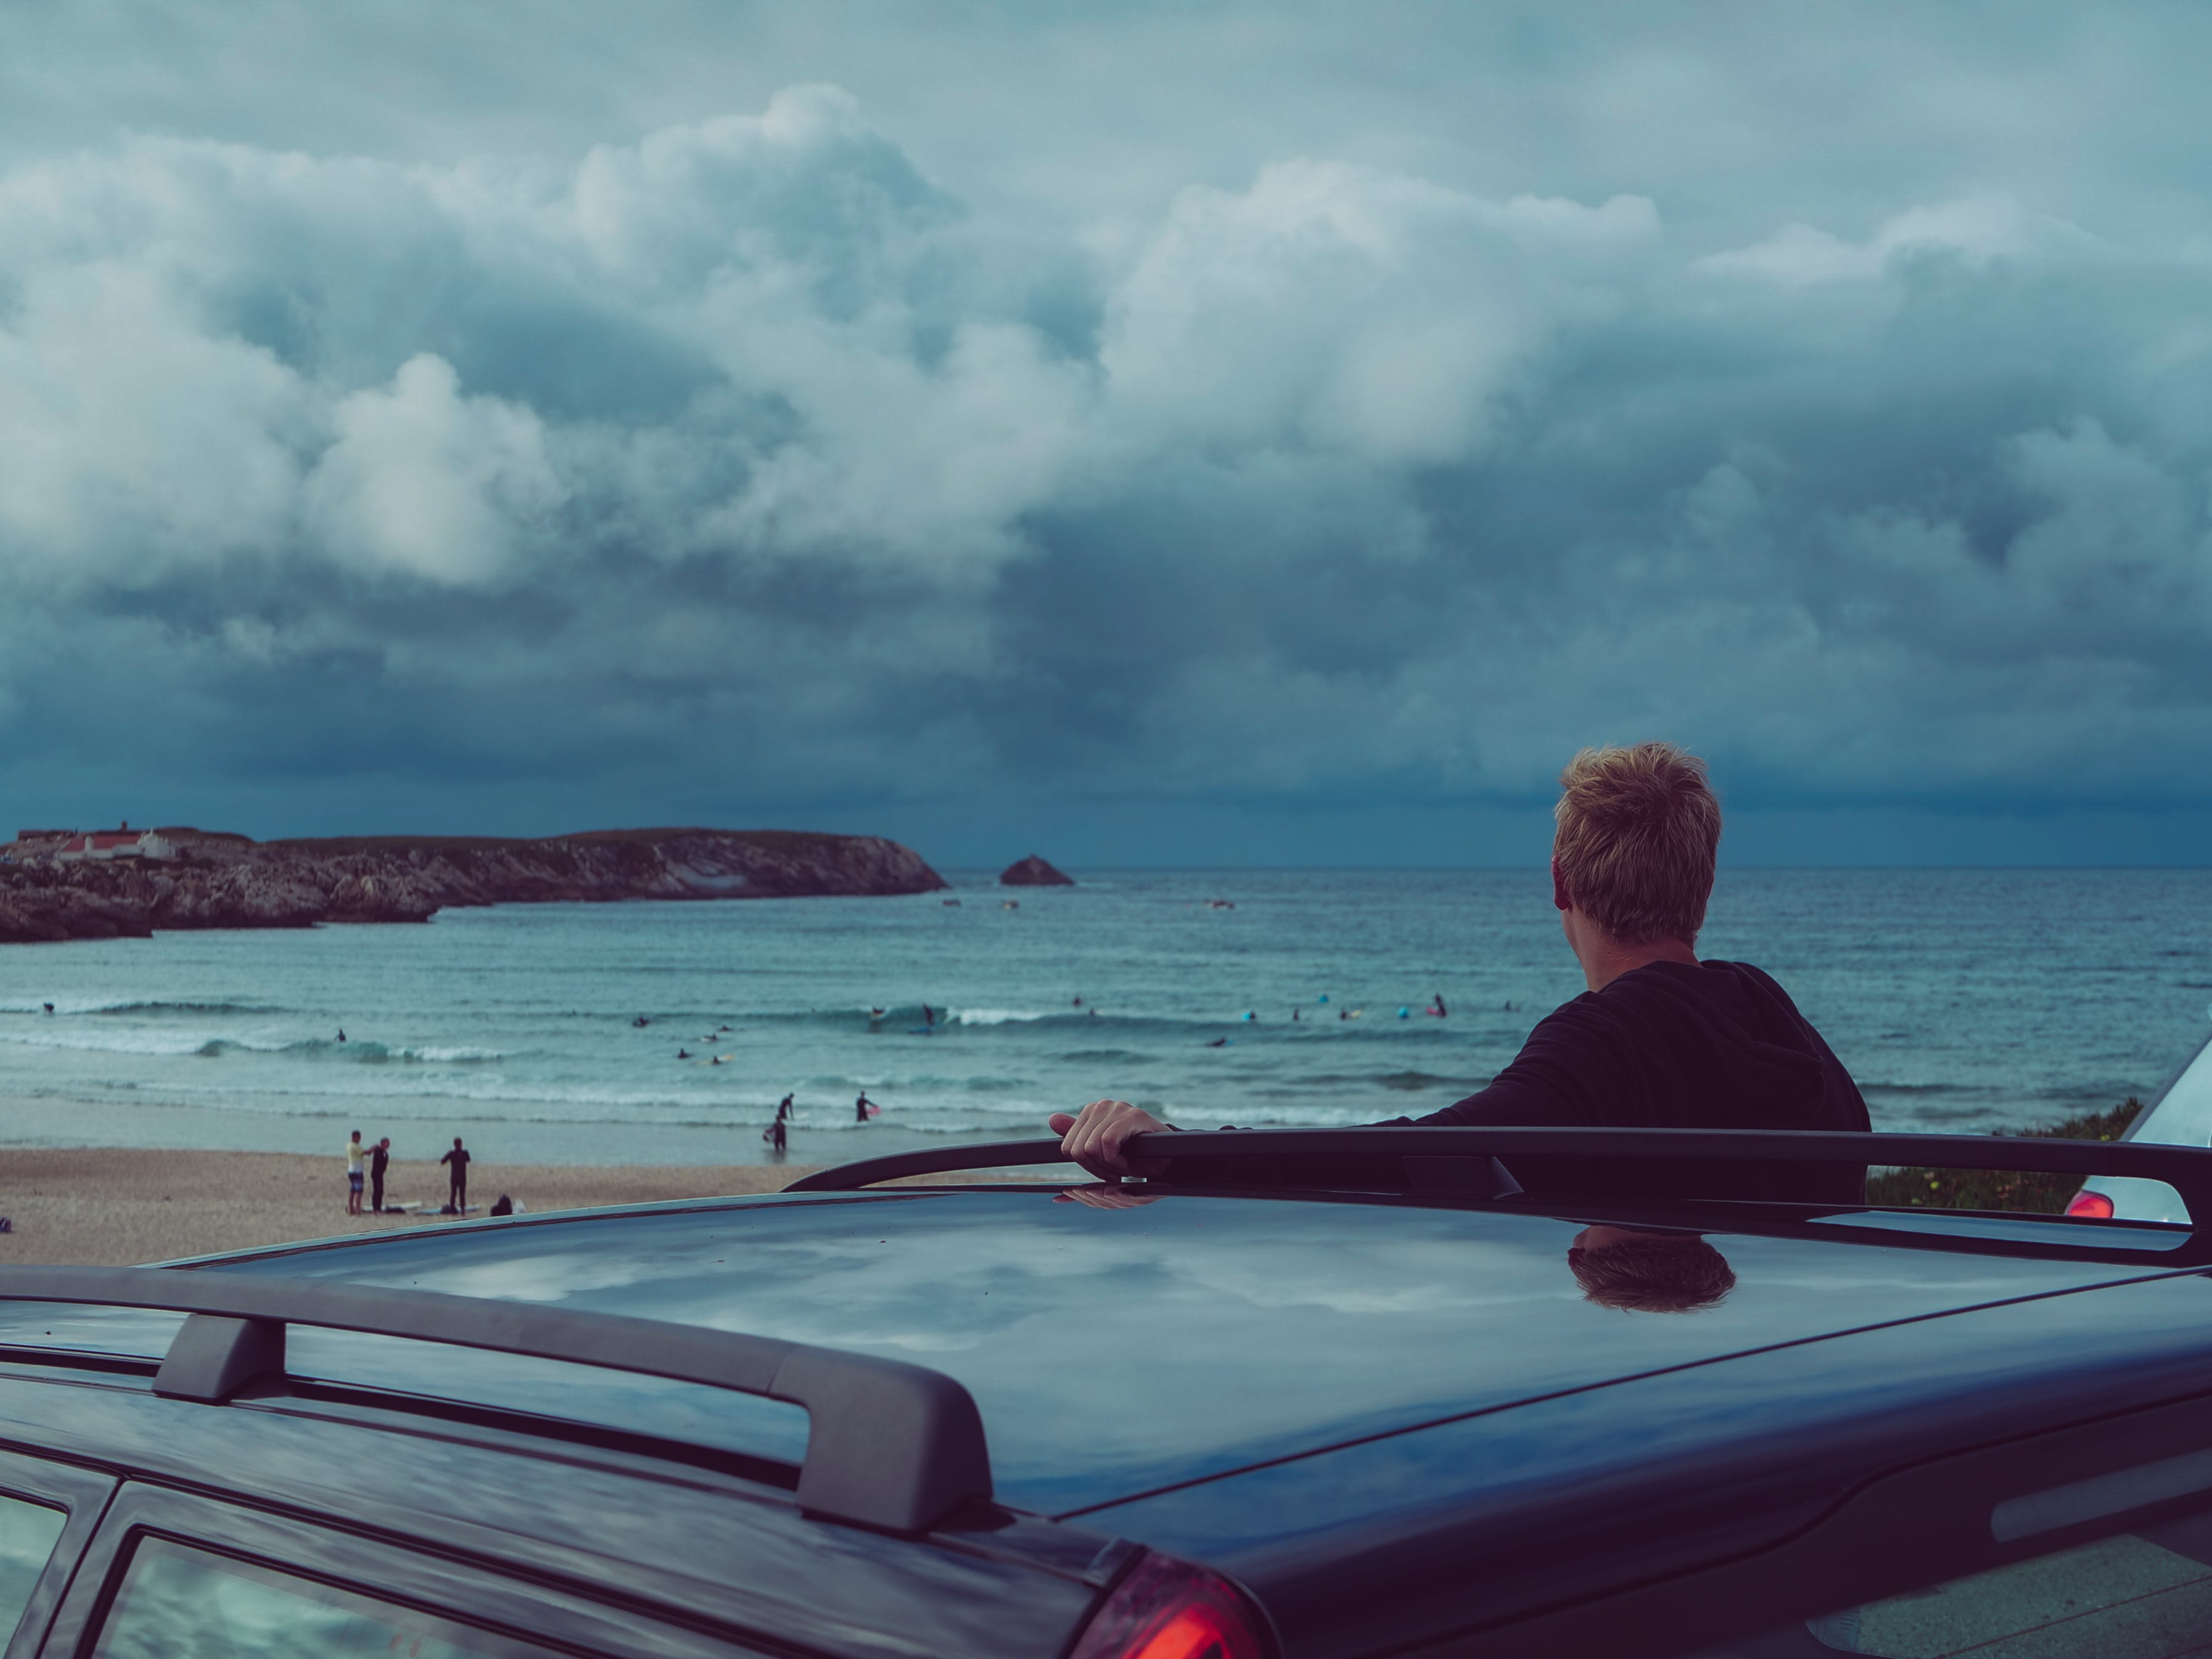 Man Looking At The Beach